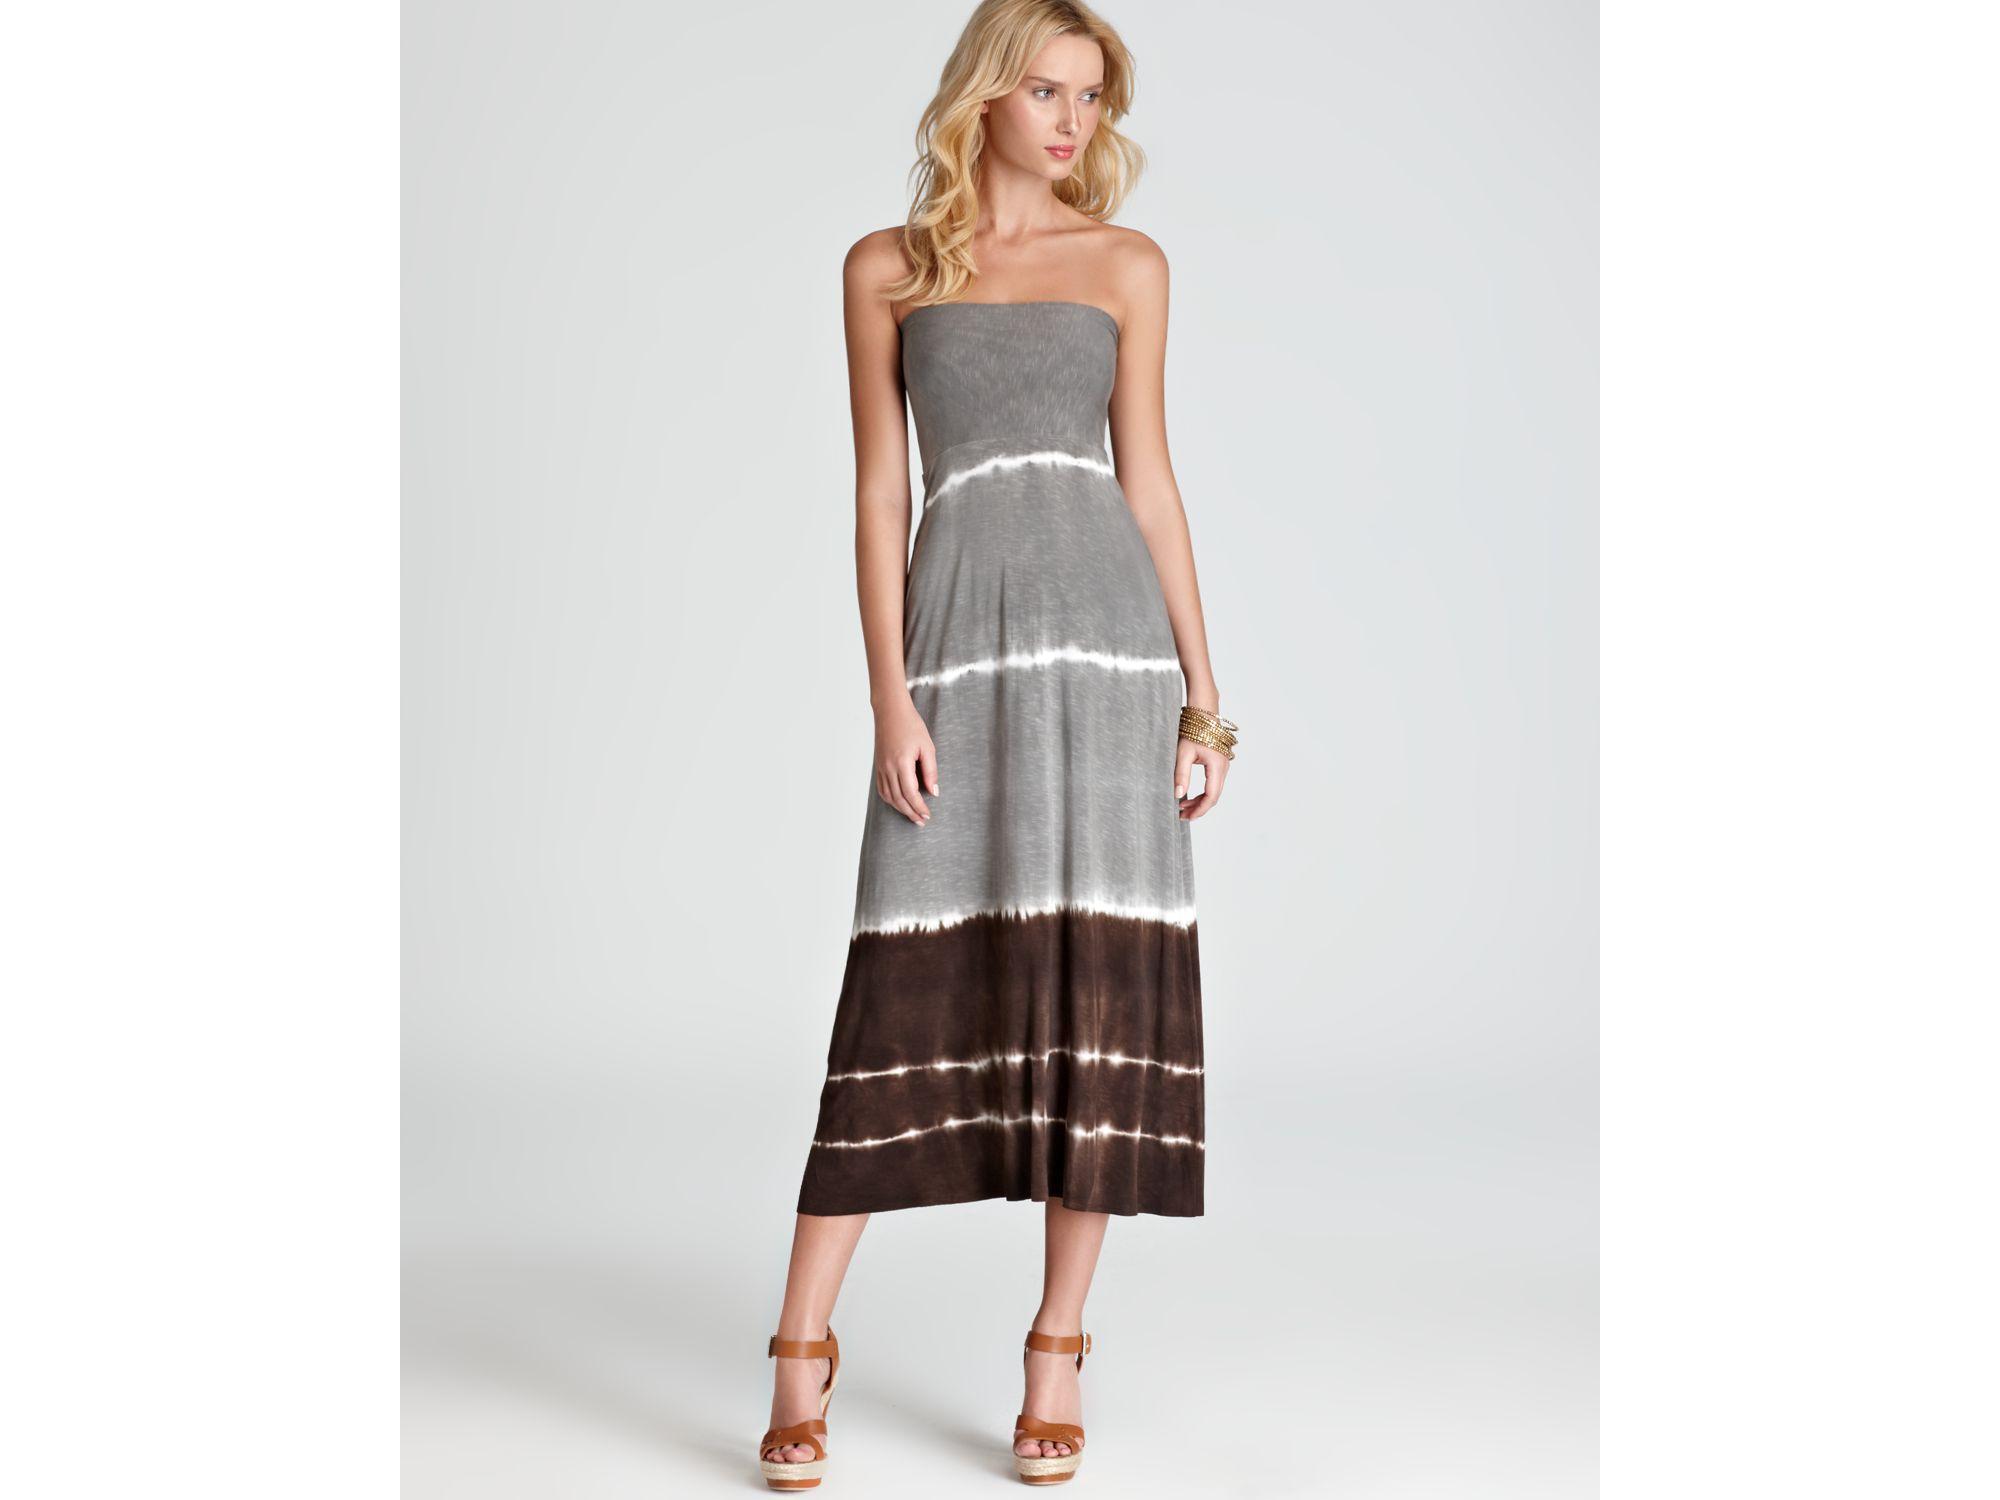 Convertible maxi tube dress